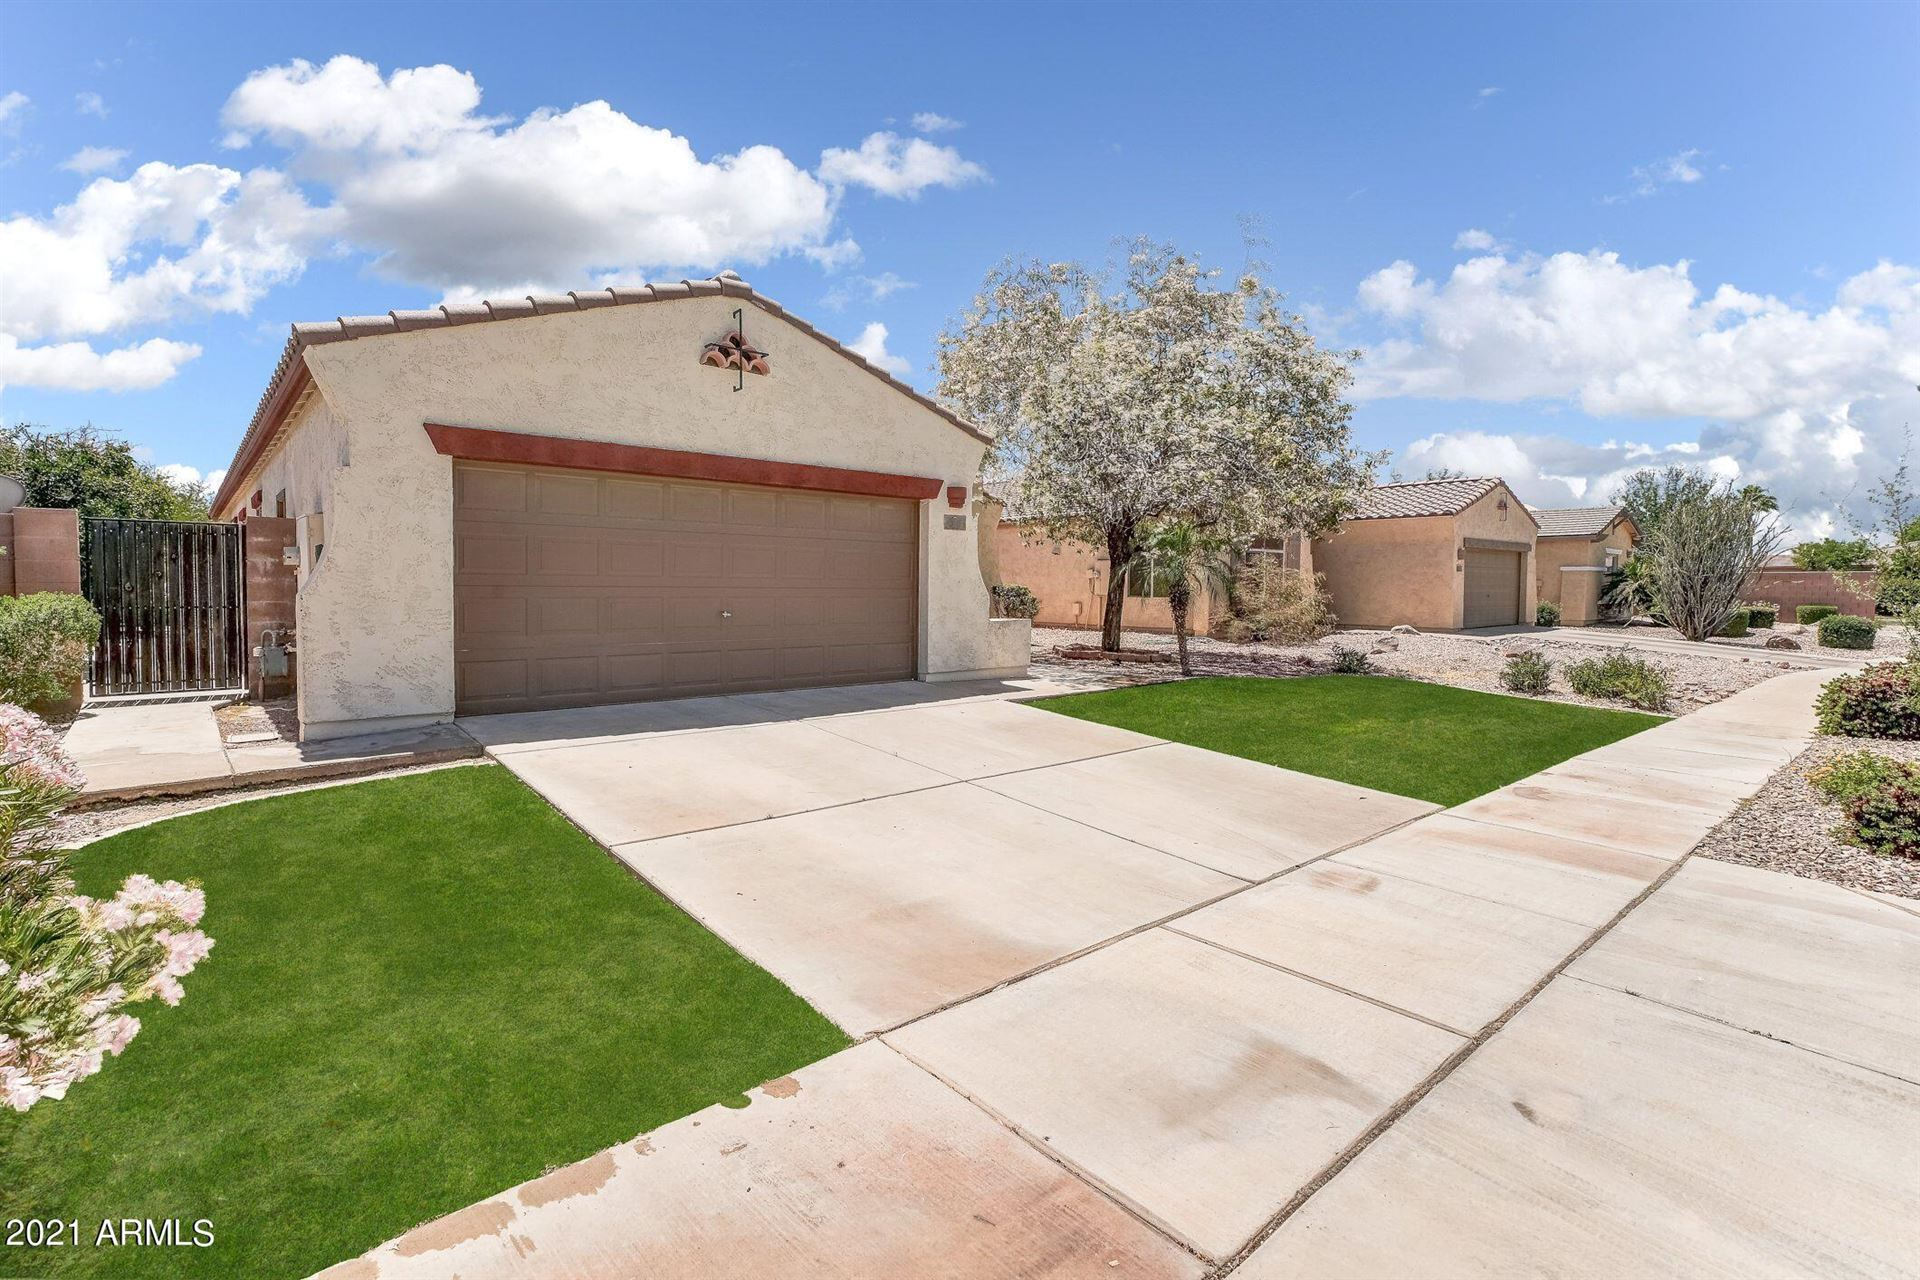 Photo of 841 E LA COSTA Place, Chandler, AZ 85249 (MLS # 6233860)